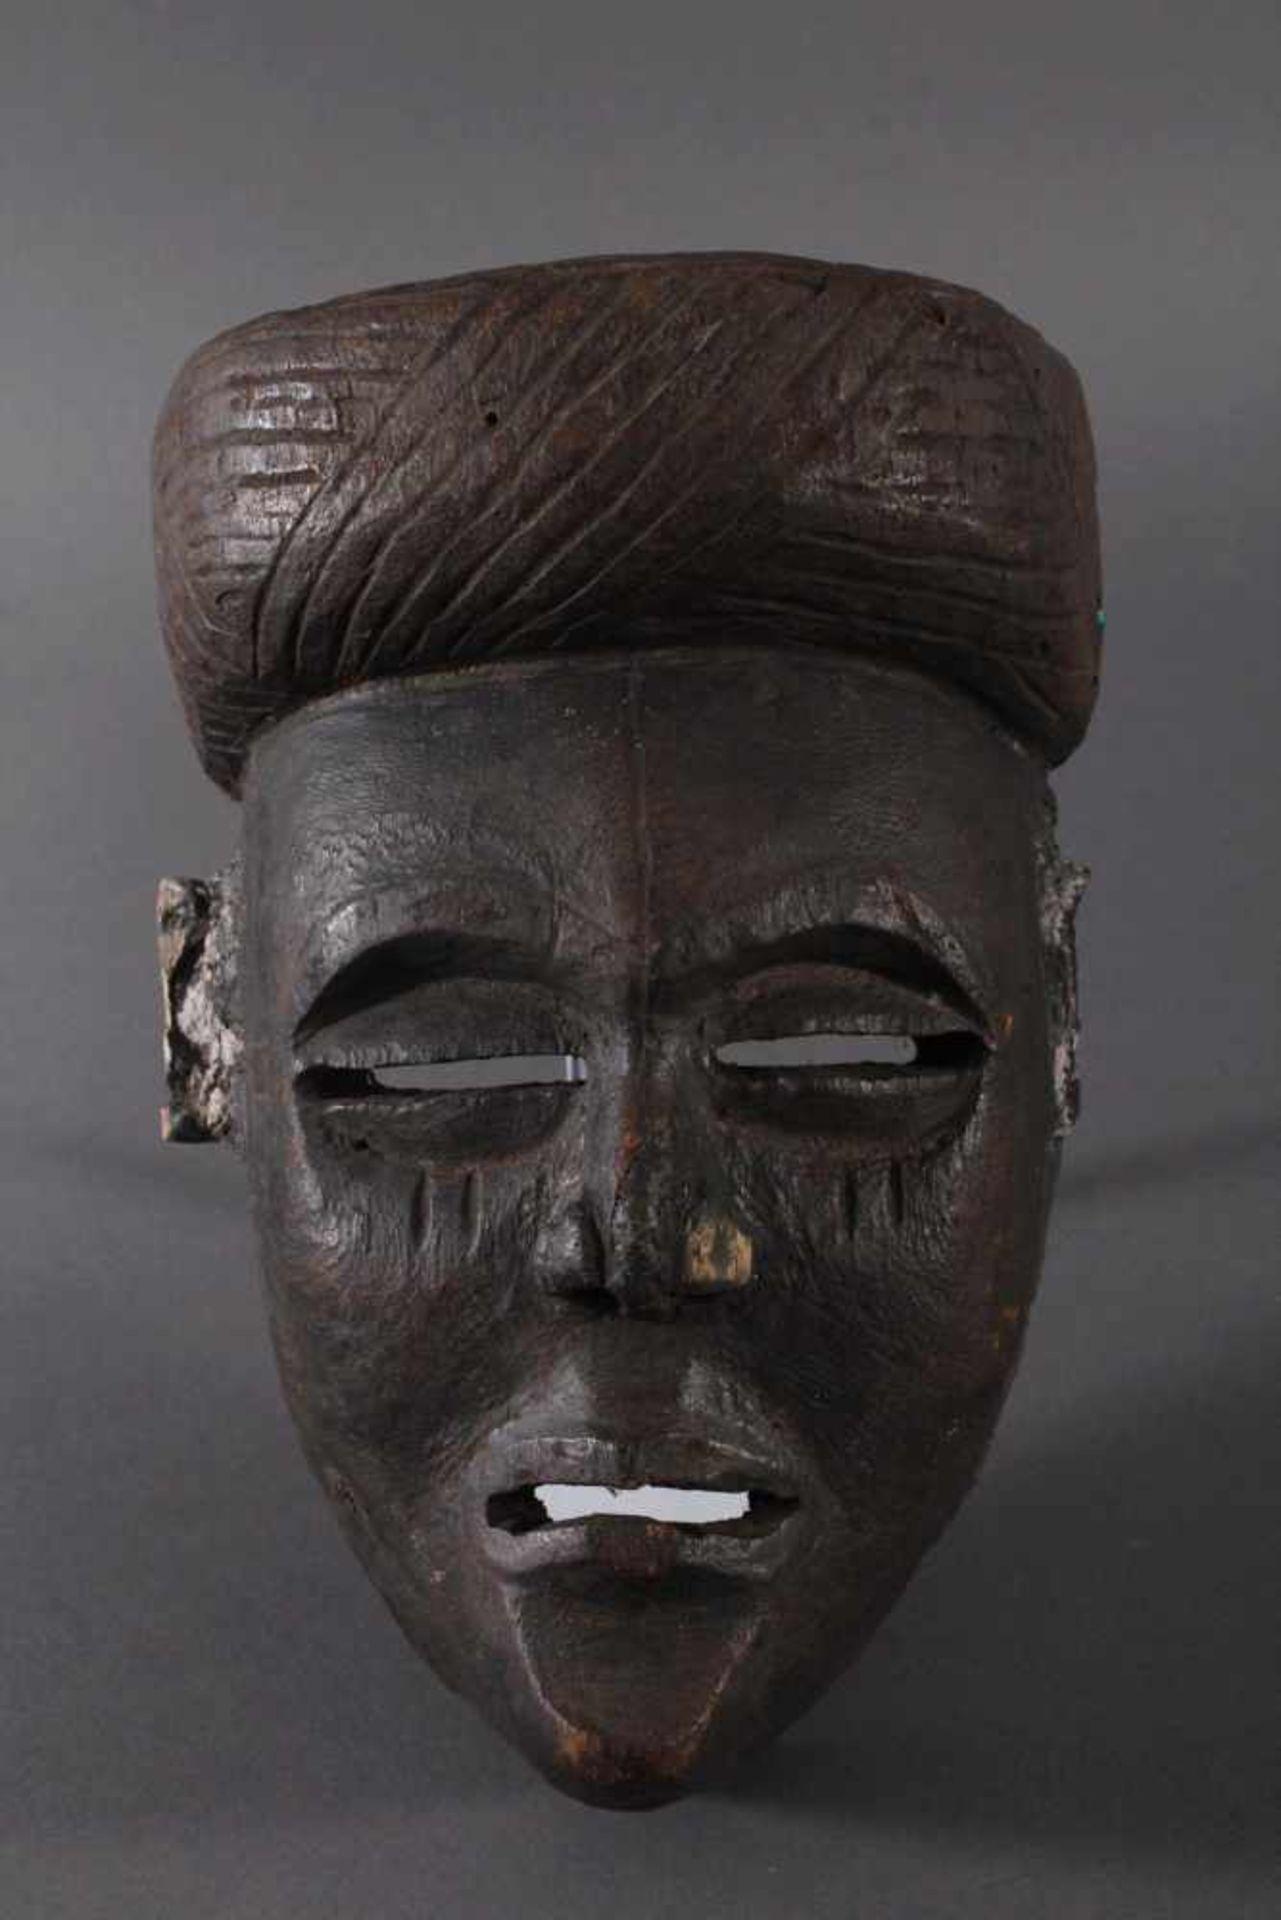 Antike Maske, Angola, Luena 20. Jh.Holz geschnitzt, dunkle Patina, Narbentatauierung, Ohren